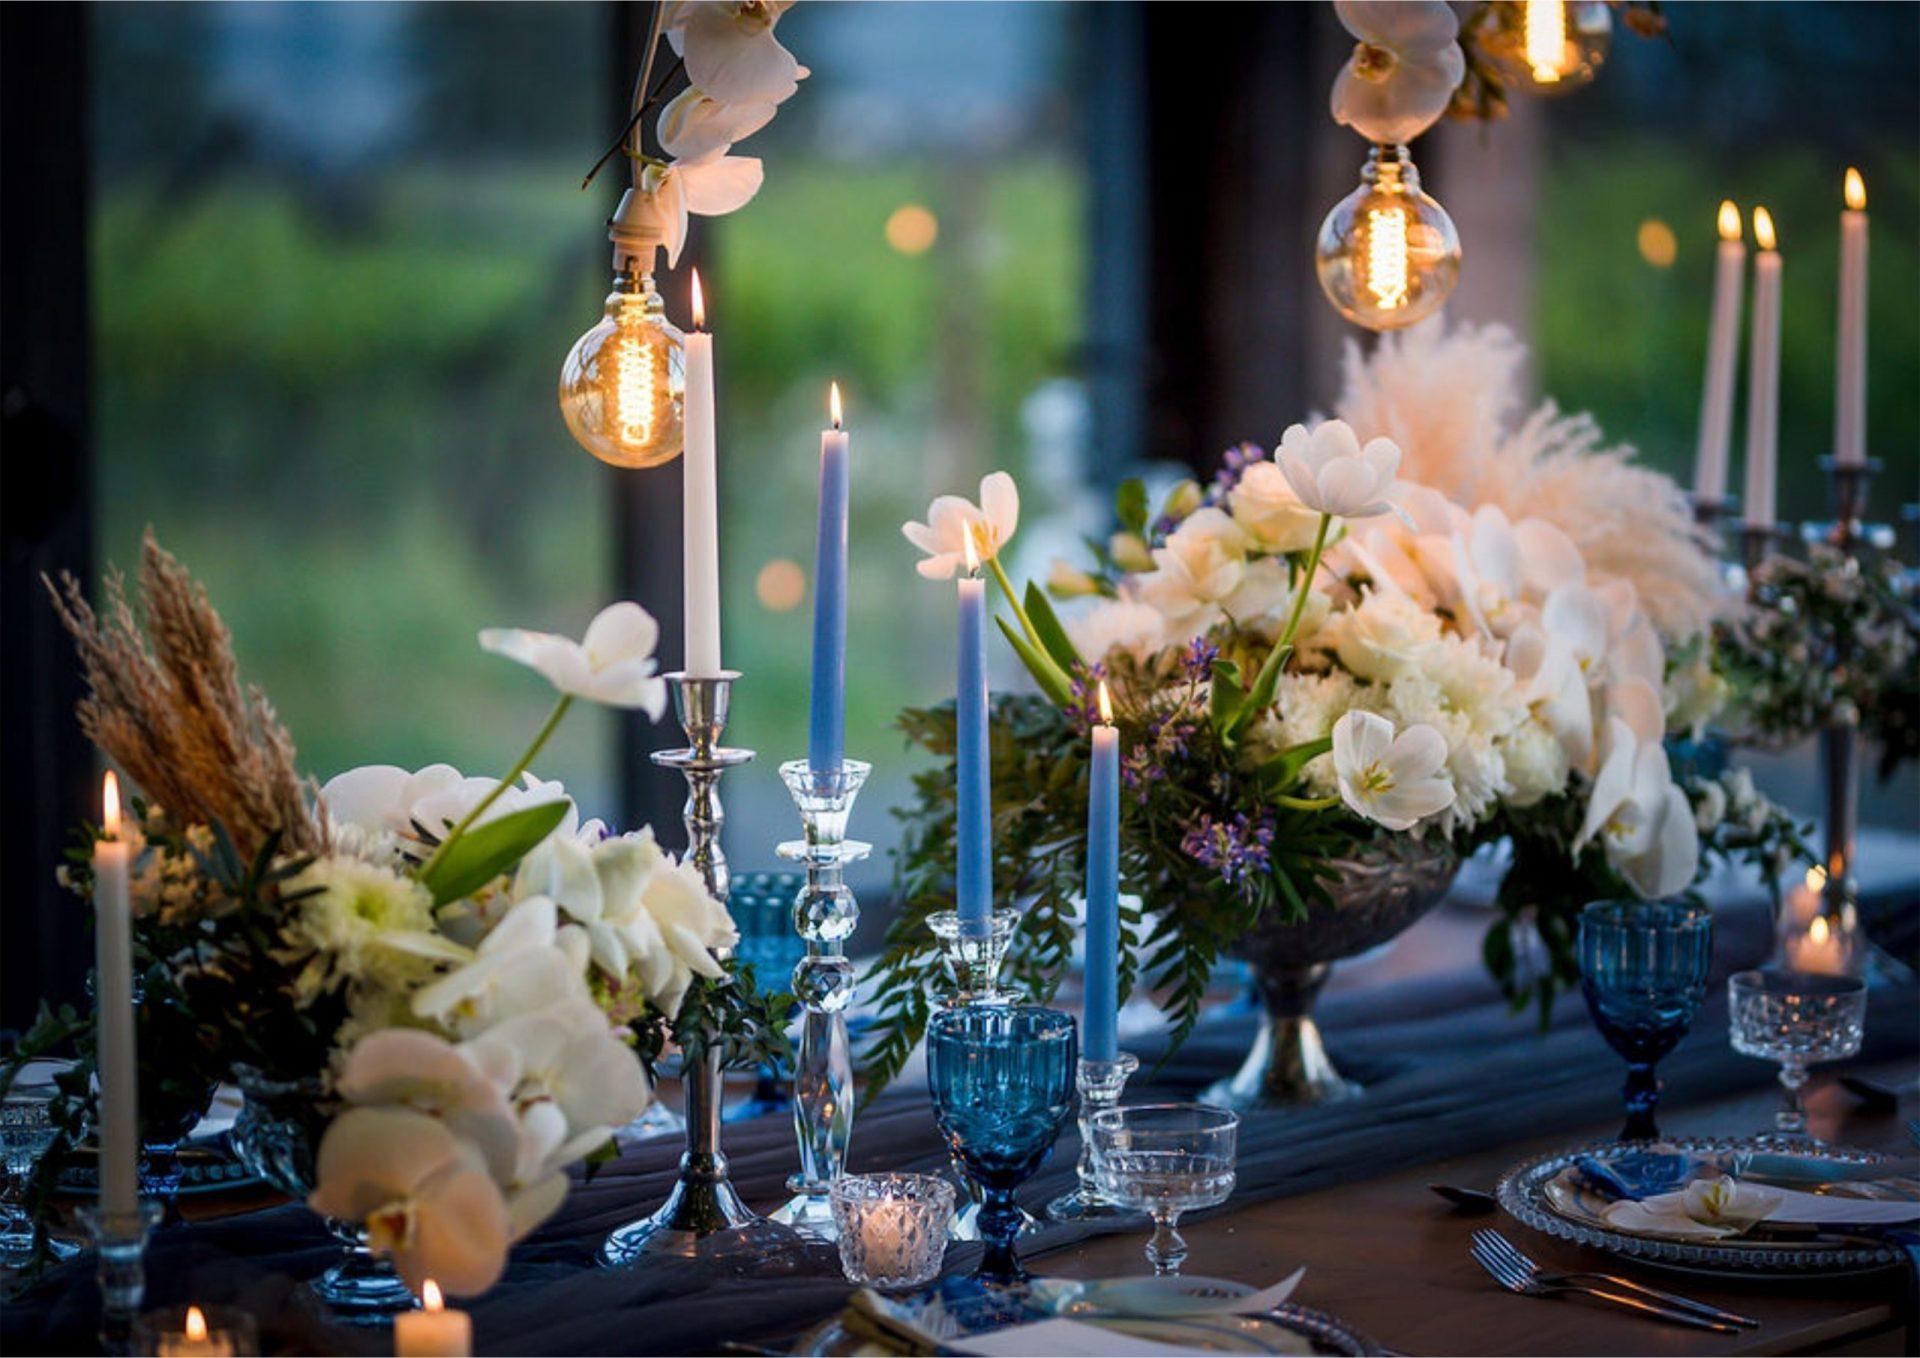 Bruidsgids Wedding Guide My Pretty Vintage Wedding Table Evening Light Wedding Decor Photography by Gustav Klotz